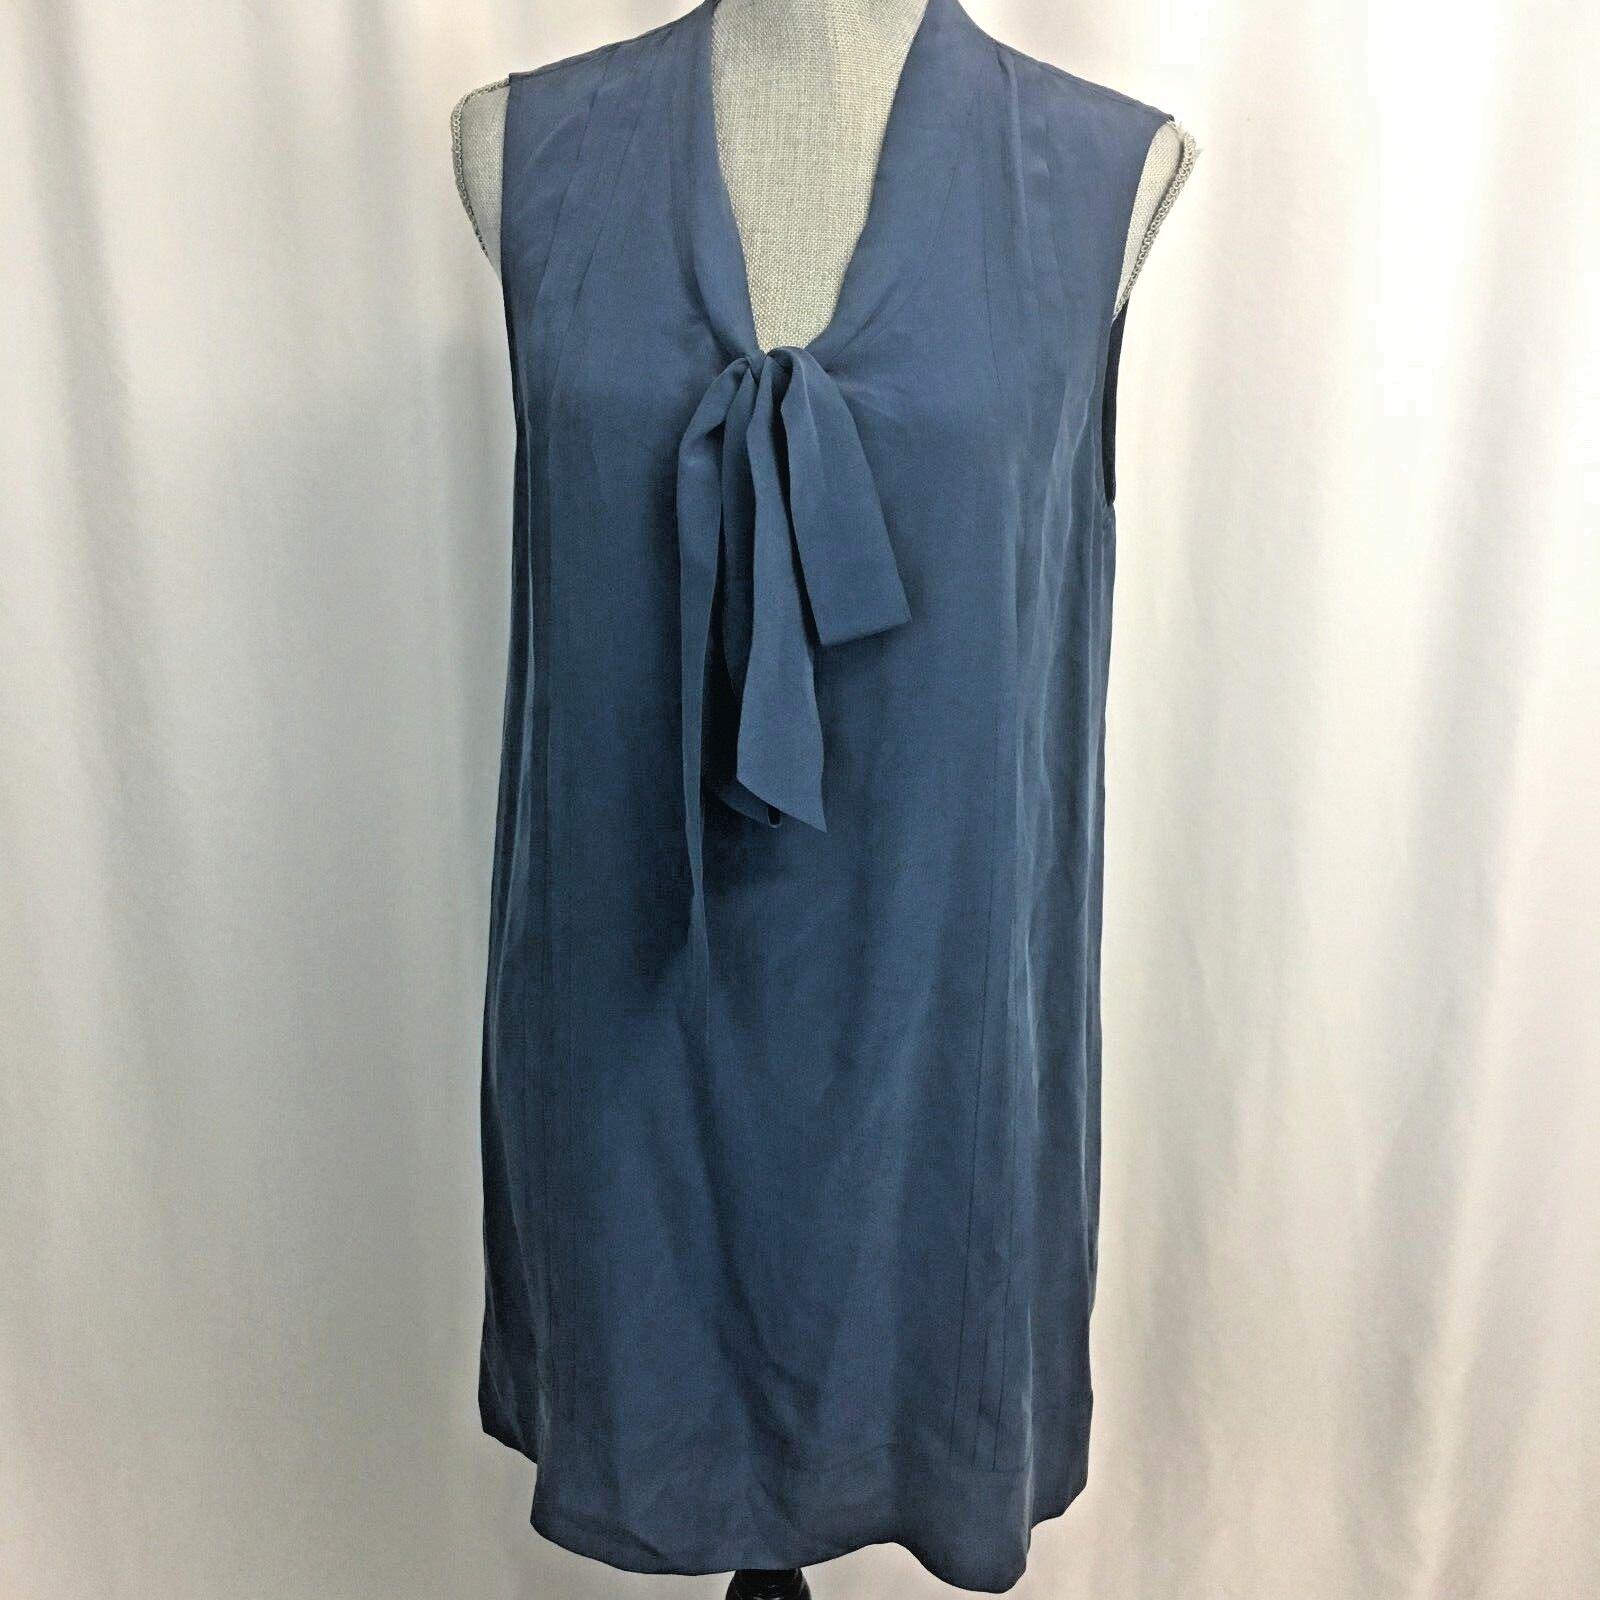 JOIE Medium M 100% Silk Blau Tie Sleeveless Button Work Dress Tunic Blouse Top